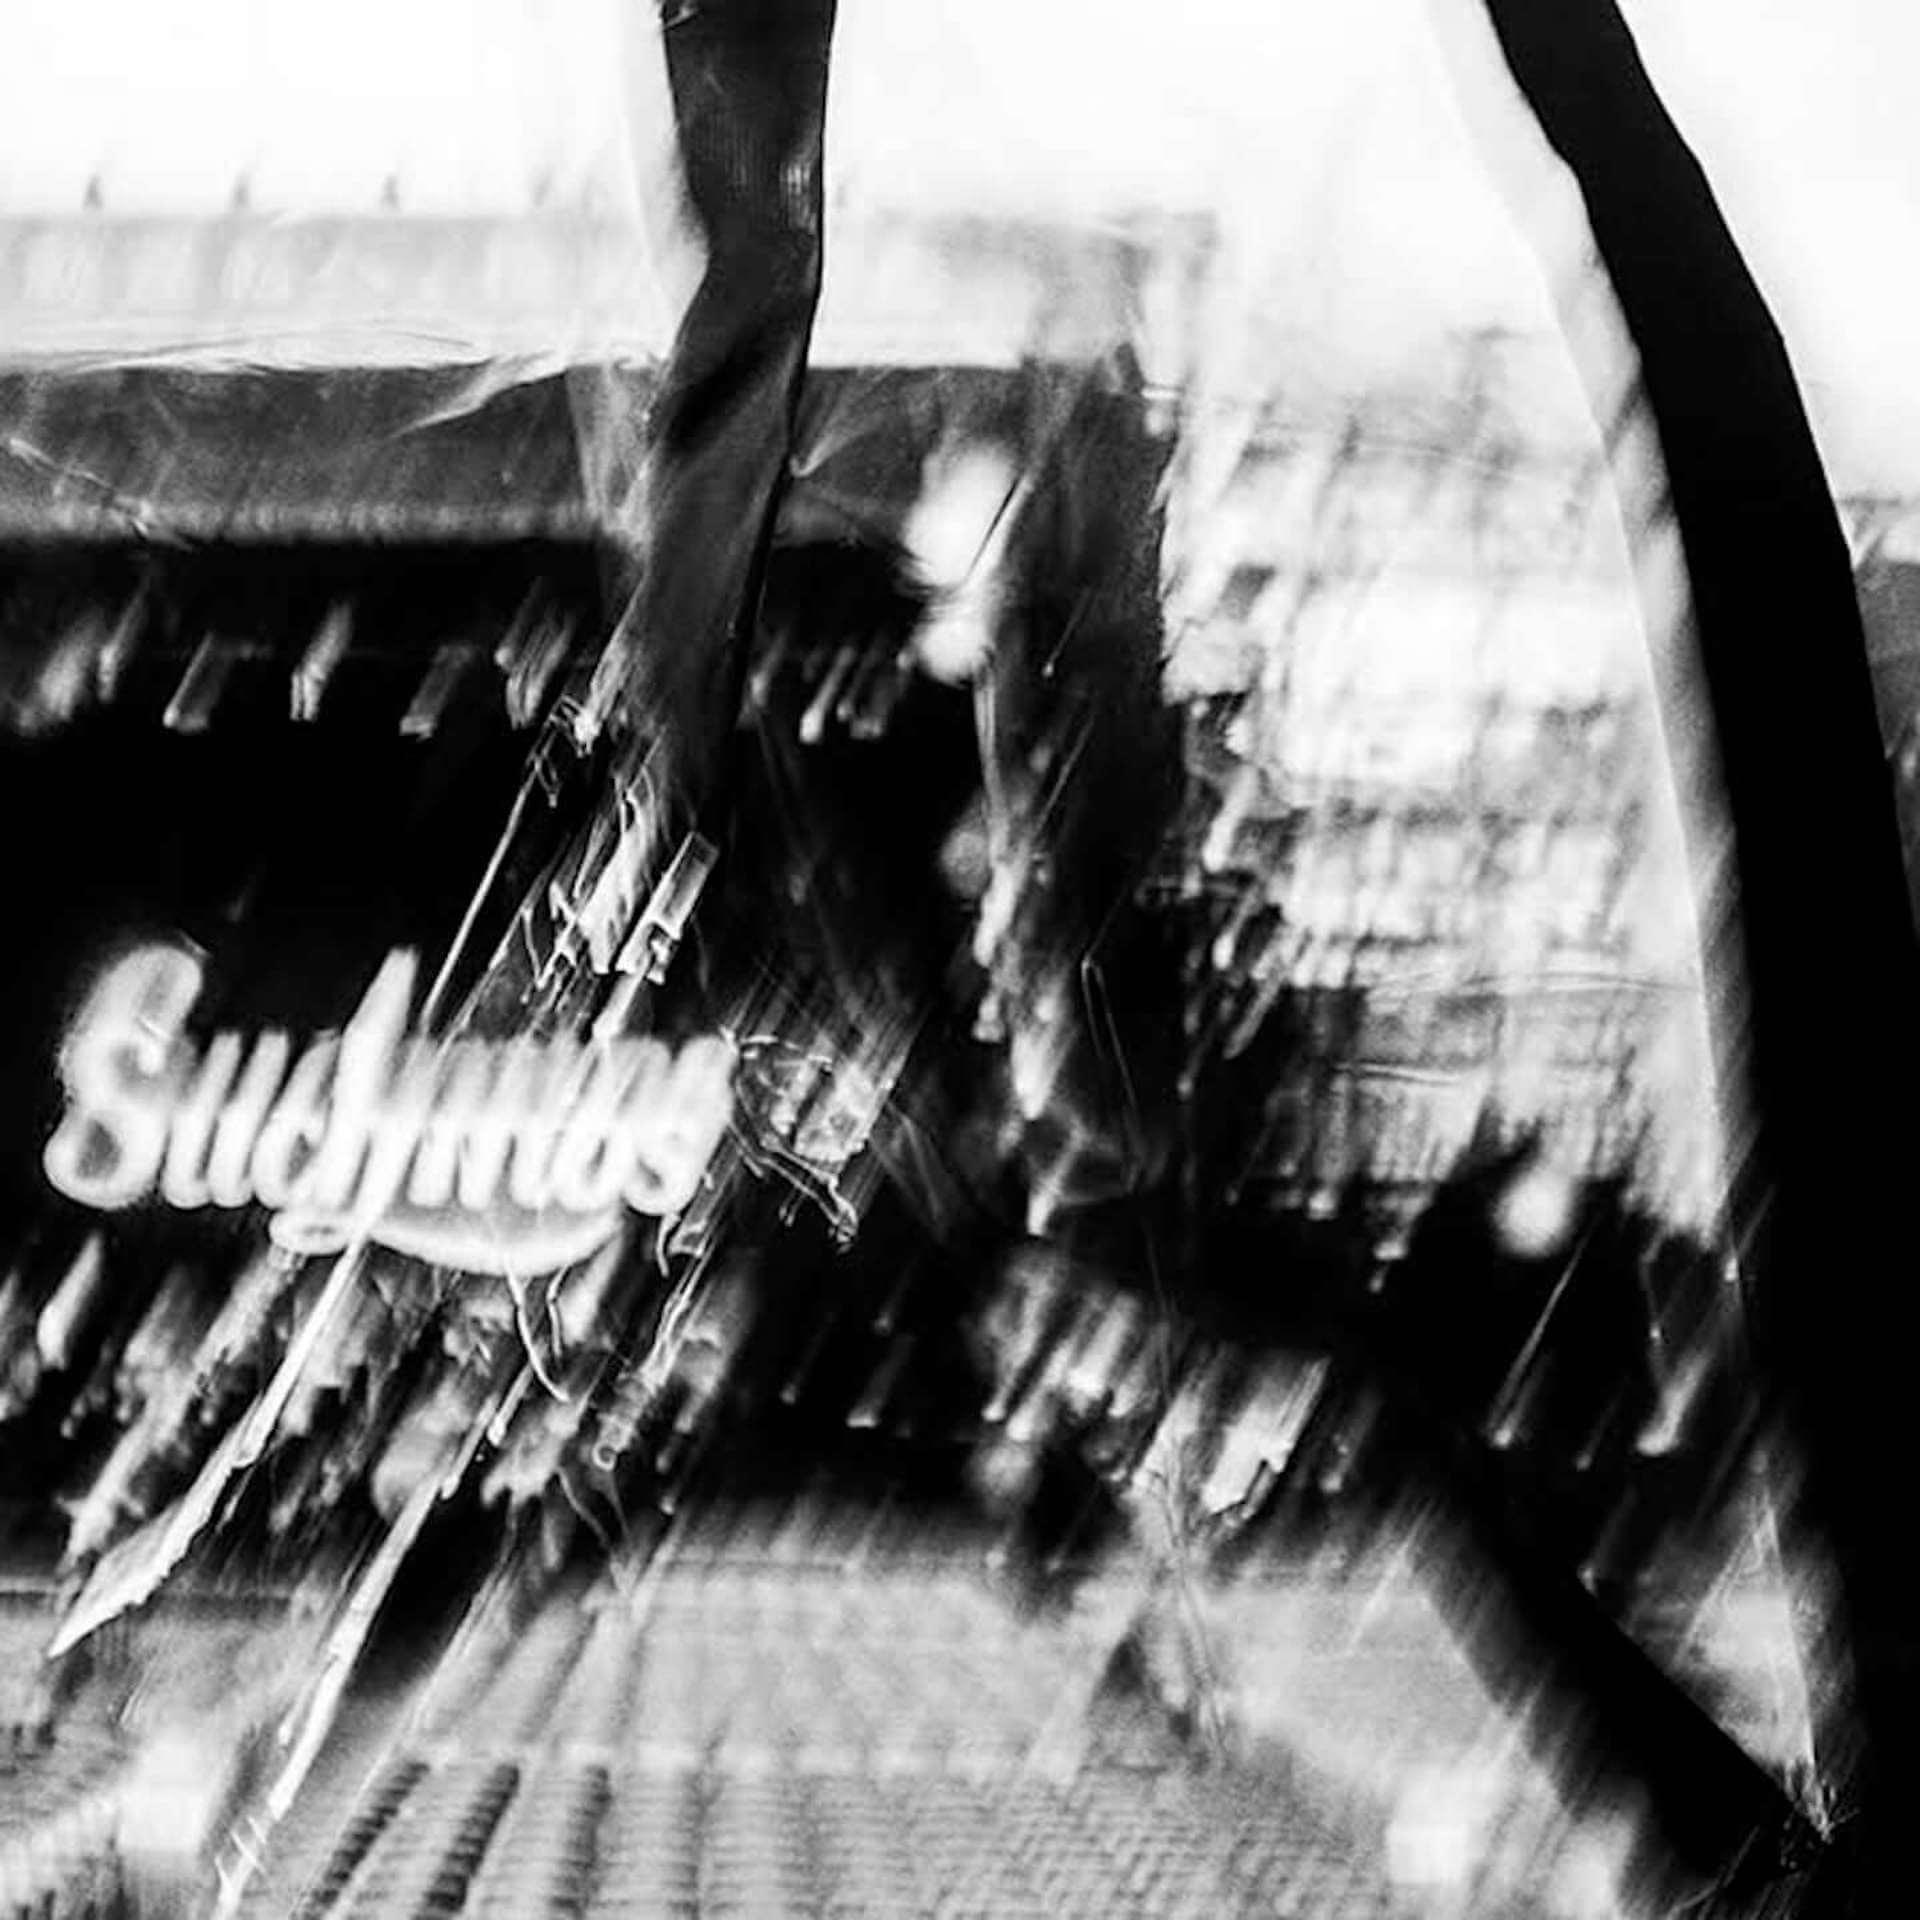 【Photo Documentary】Suchmos THE LIVE 横浜スタジアム music200120_suchmos_2